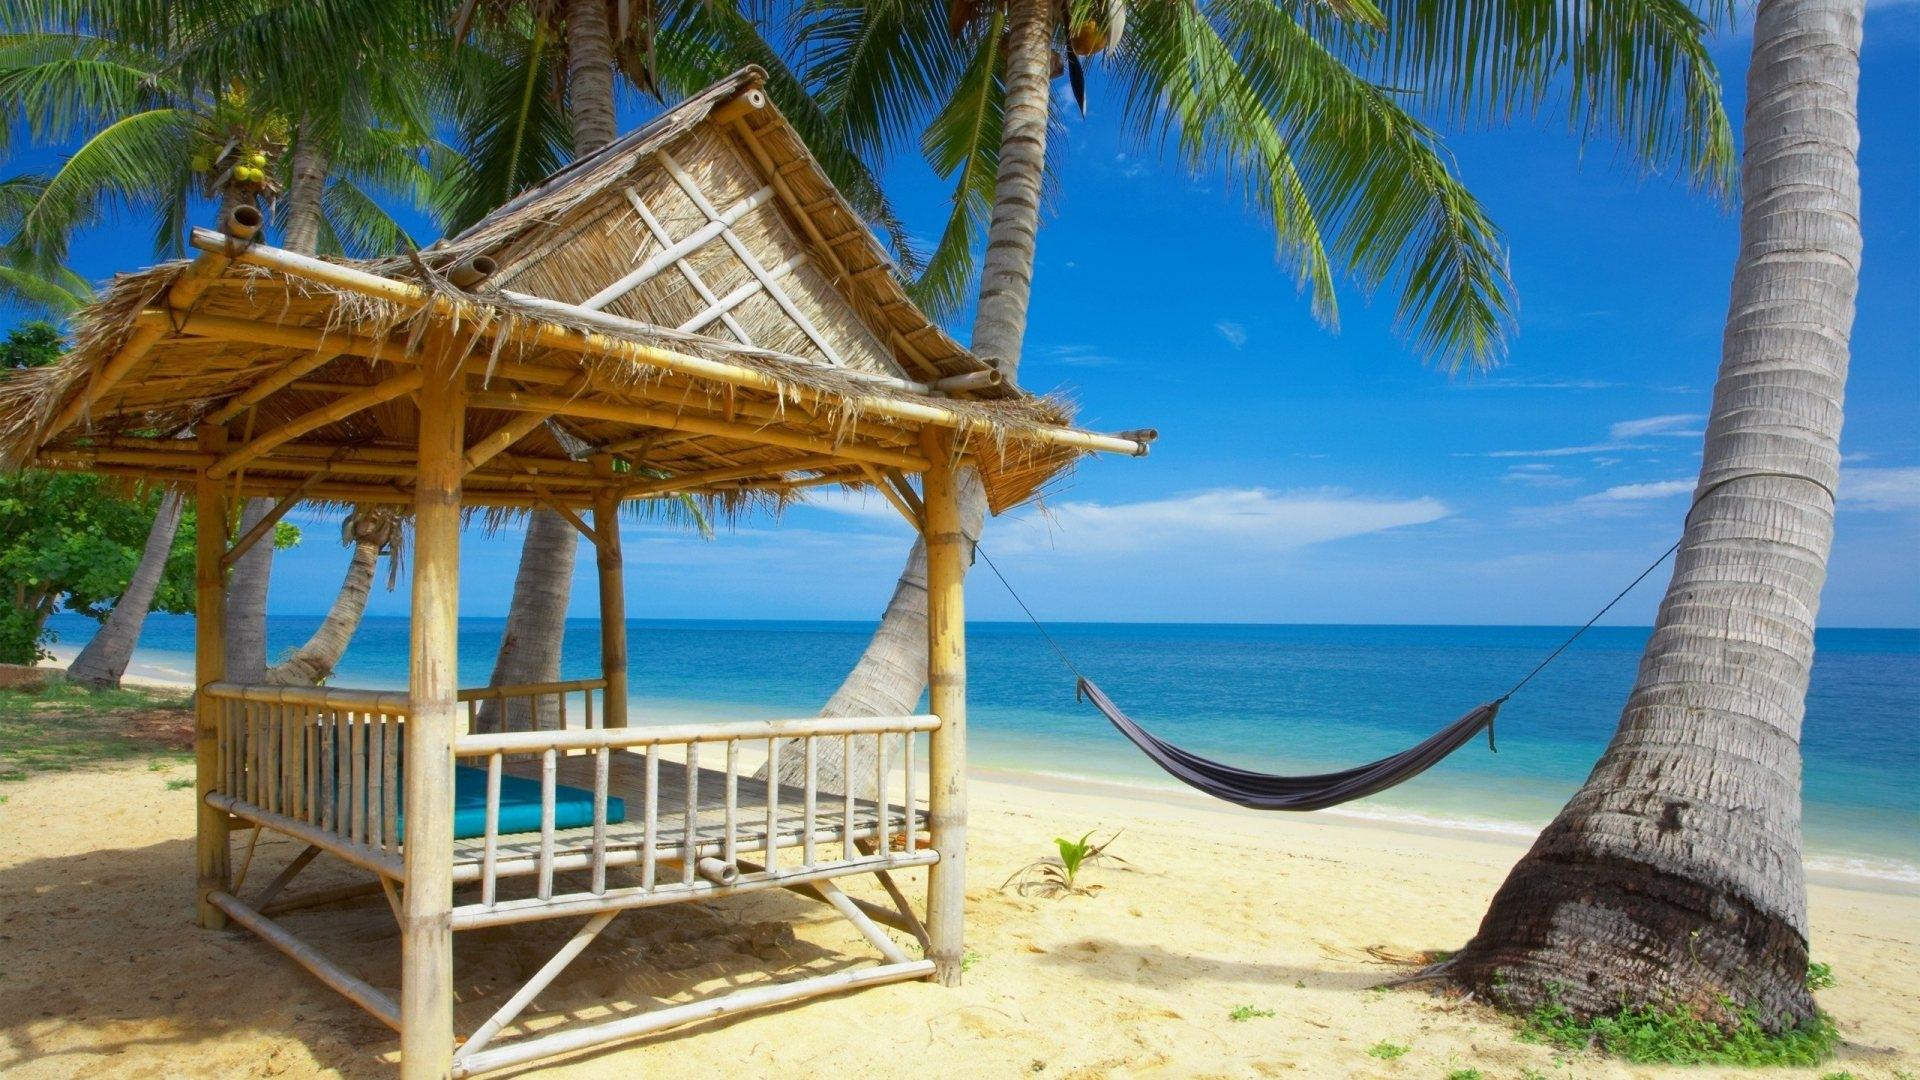 Hd Tropical Island Beach Paradise Wallpapers And Backgrounds: Free Beach Wallpapers And Screensavers